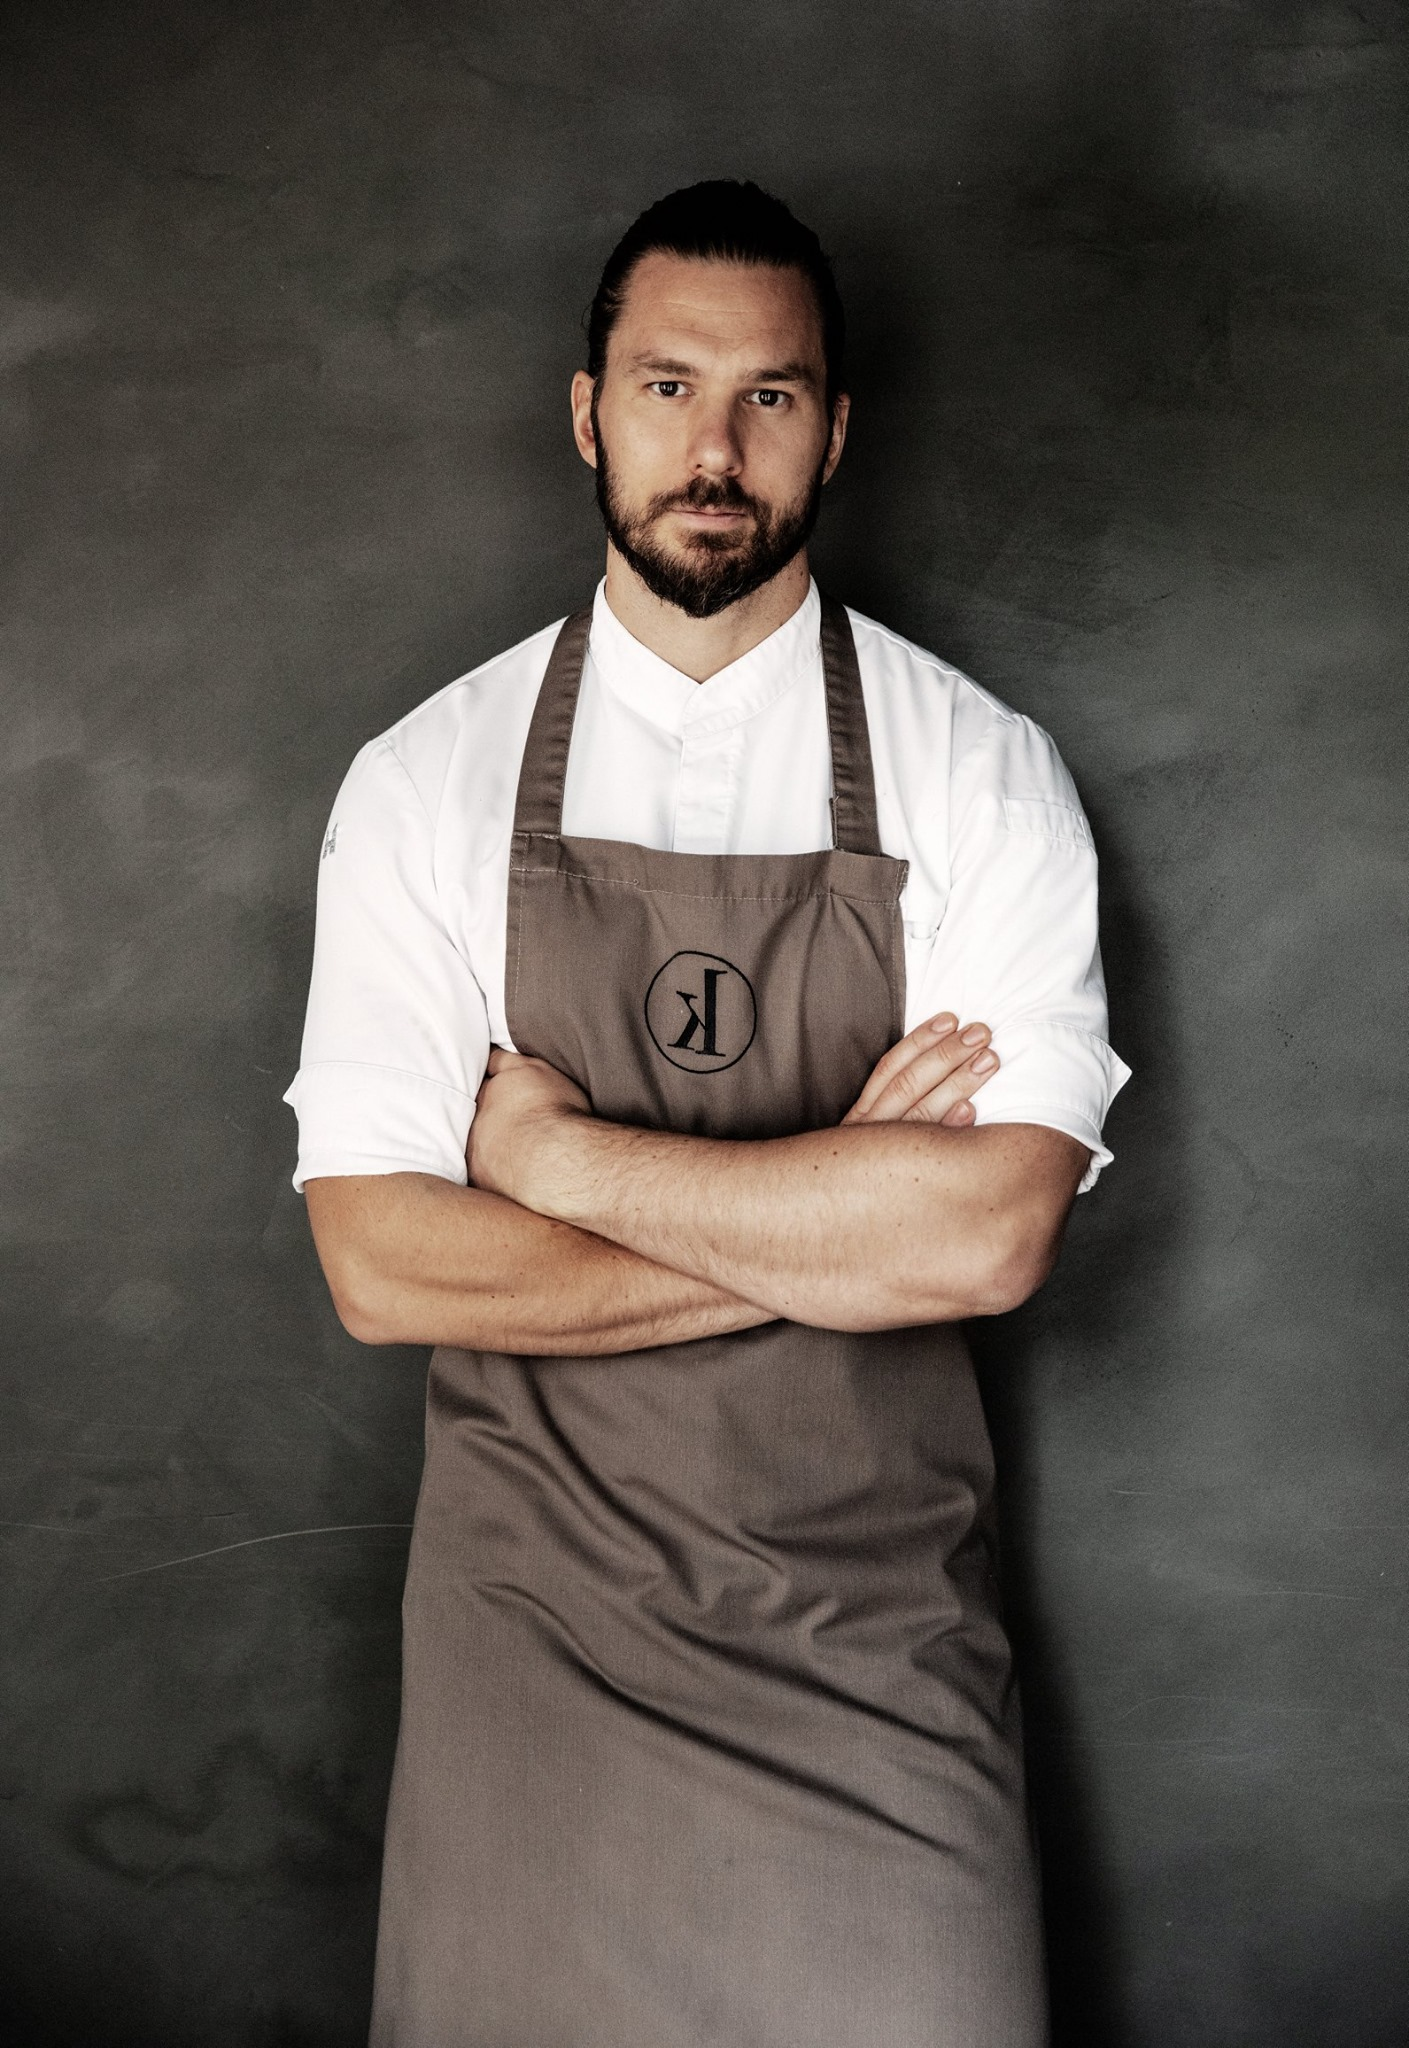 Kuchař Mikael Svensson